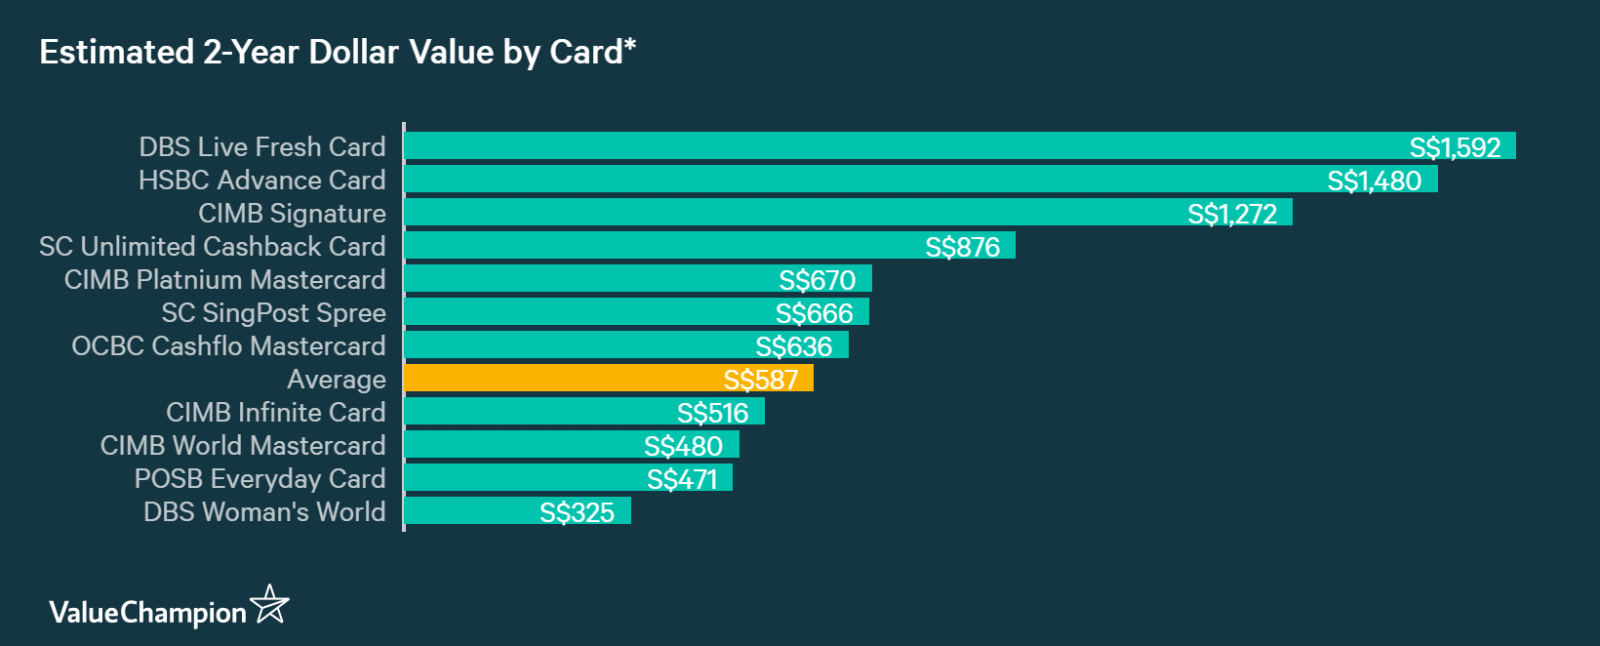 Best 0% Instalment Credit Cards 2019   ValueChampion Singapore